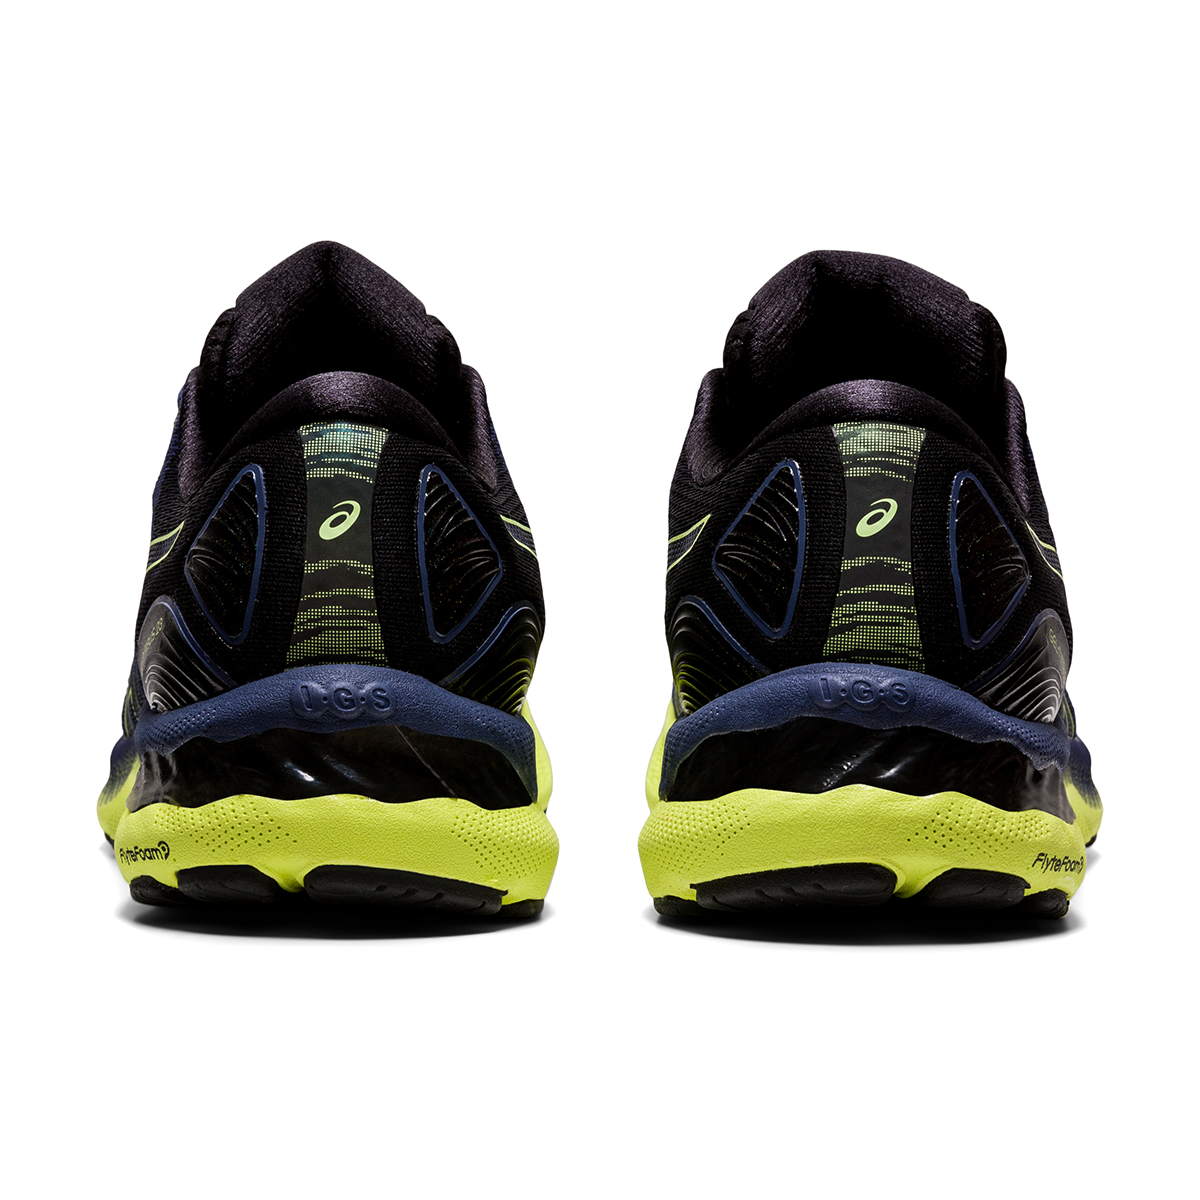 Men's Asics Gel-Nimbus 23 Running Shoe - Color: Thunder Blue - Size: 7 - Width: Regular, Thunder Blue, large, image 5